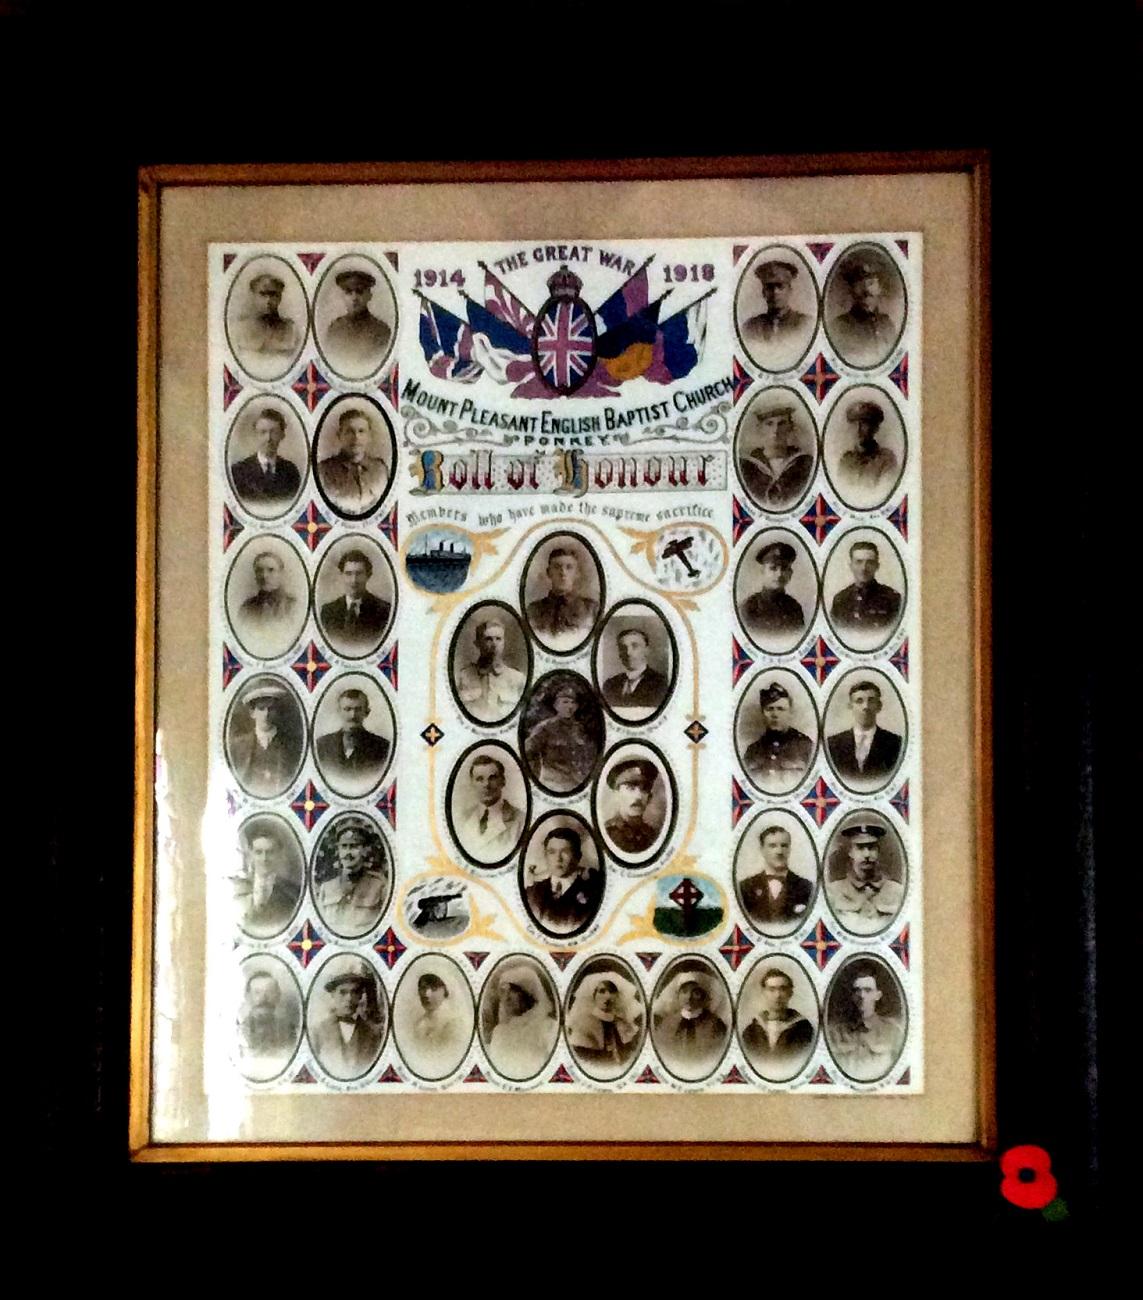 roll-of-honour-mount-pleasant-chapel-02-grevin-jones-2015